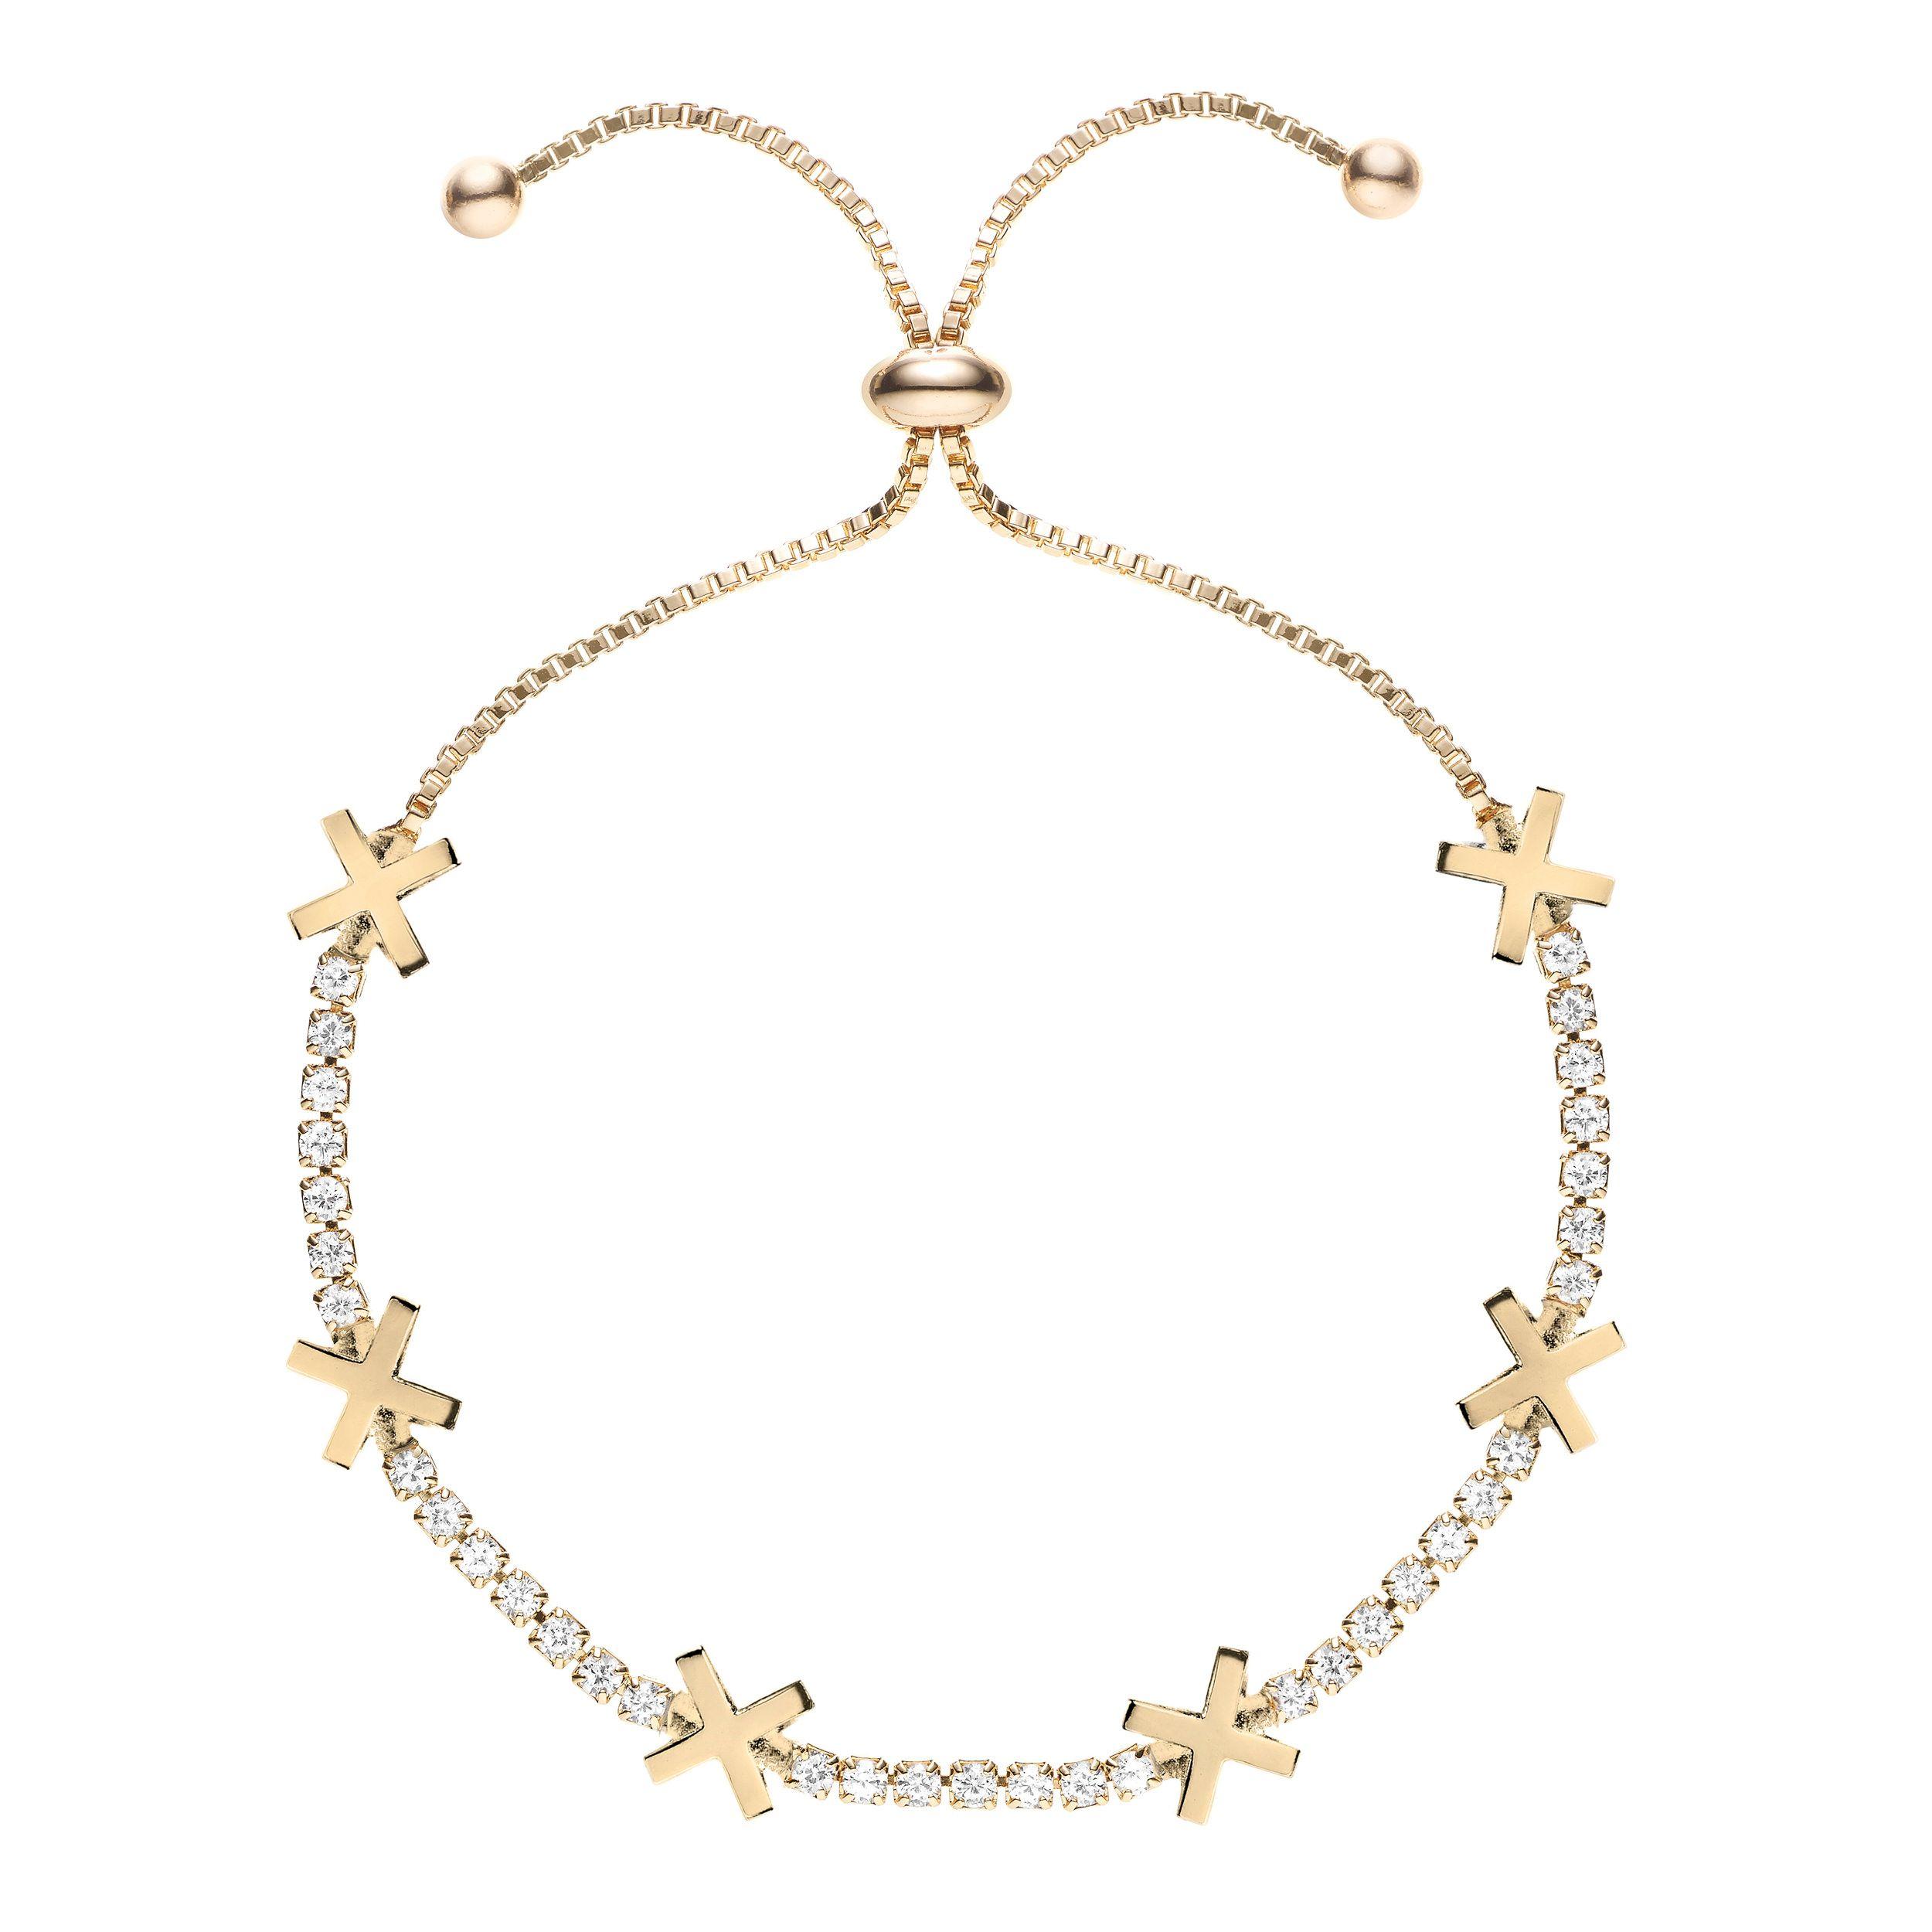 Buckley London Hugs & Kisses 'X' Bracelet - Gold